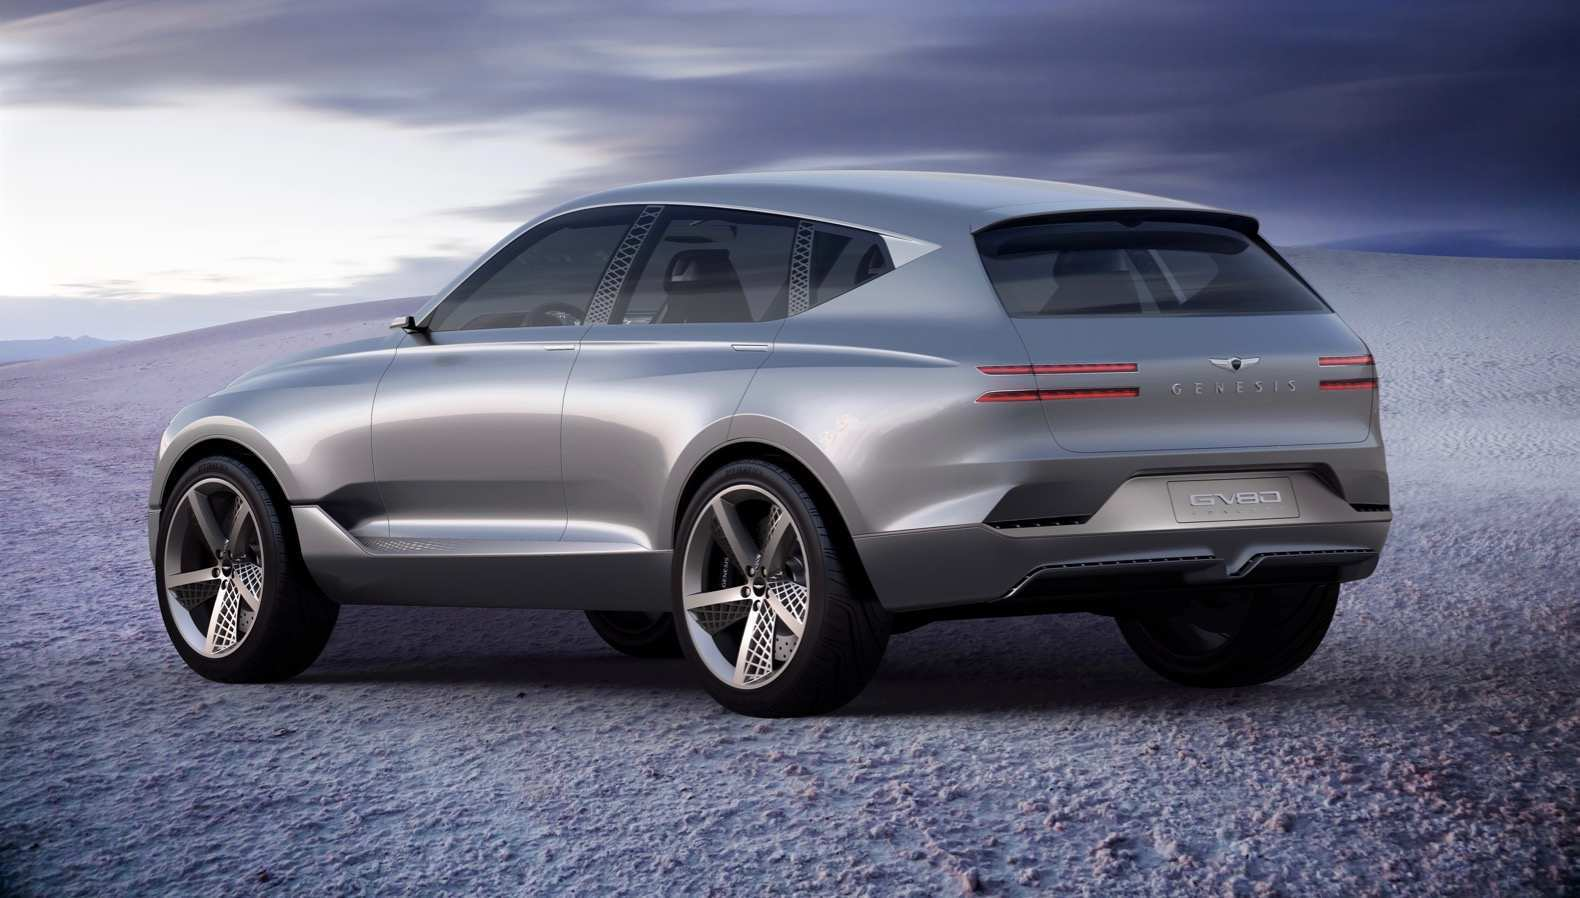 87 New 2020 Hyundai Genesis Suv Release Date for 2020 Hyundai Genesis Suv